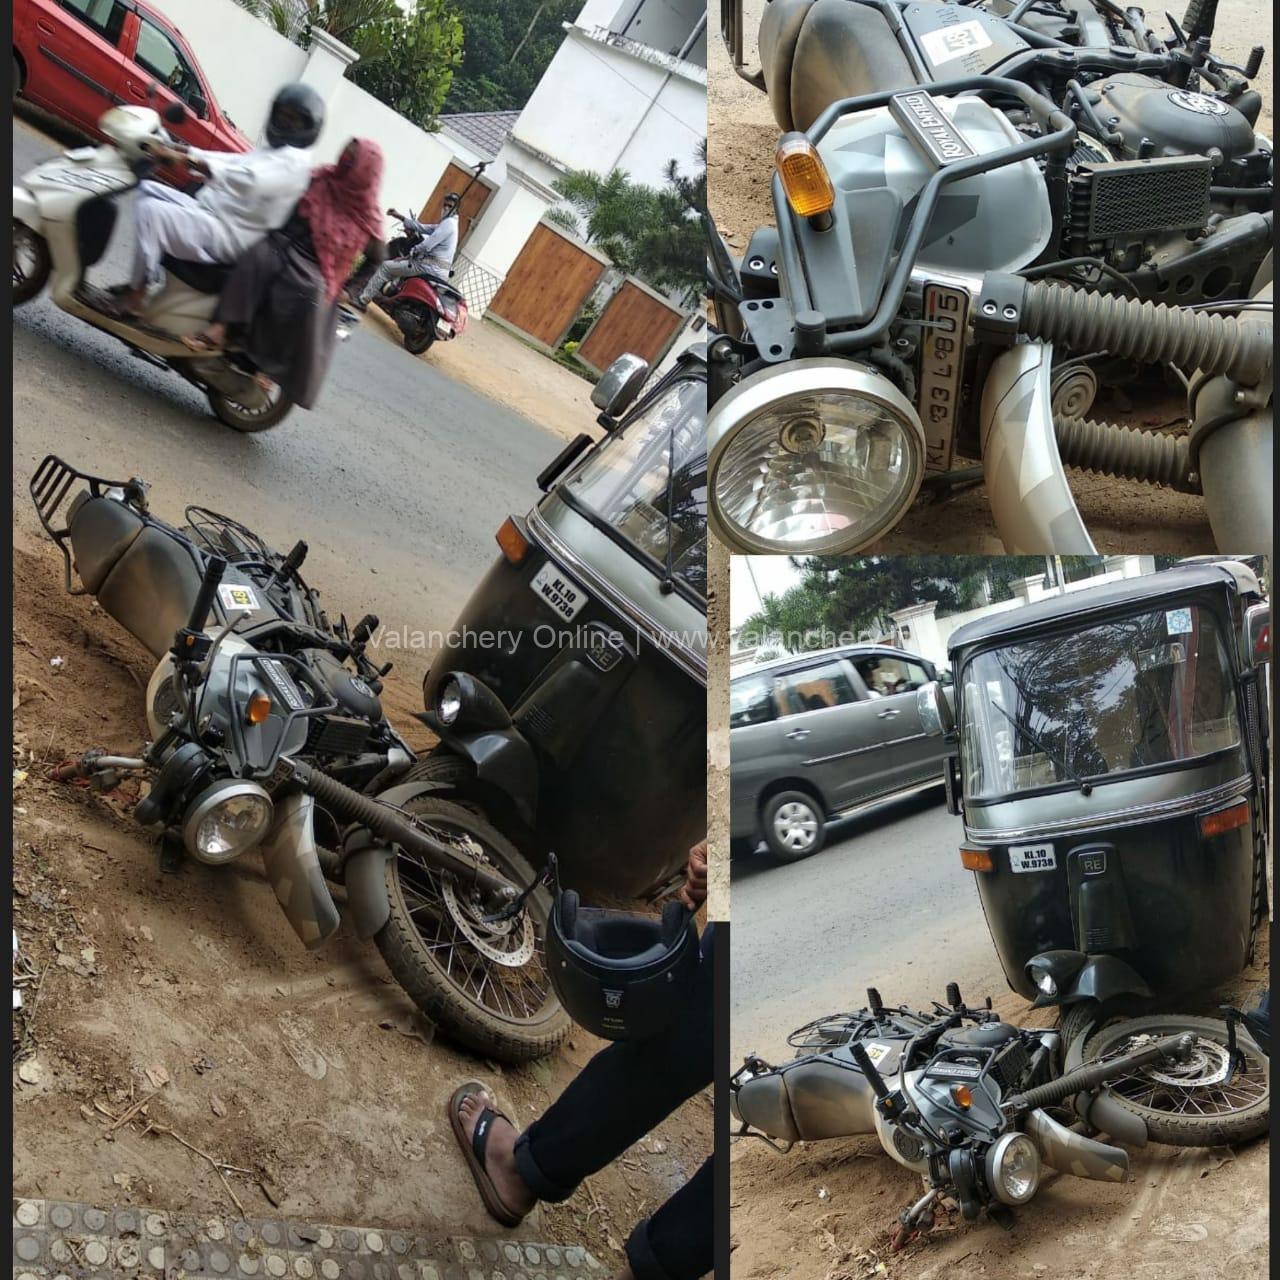 moochikkal-valanchery-accident